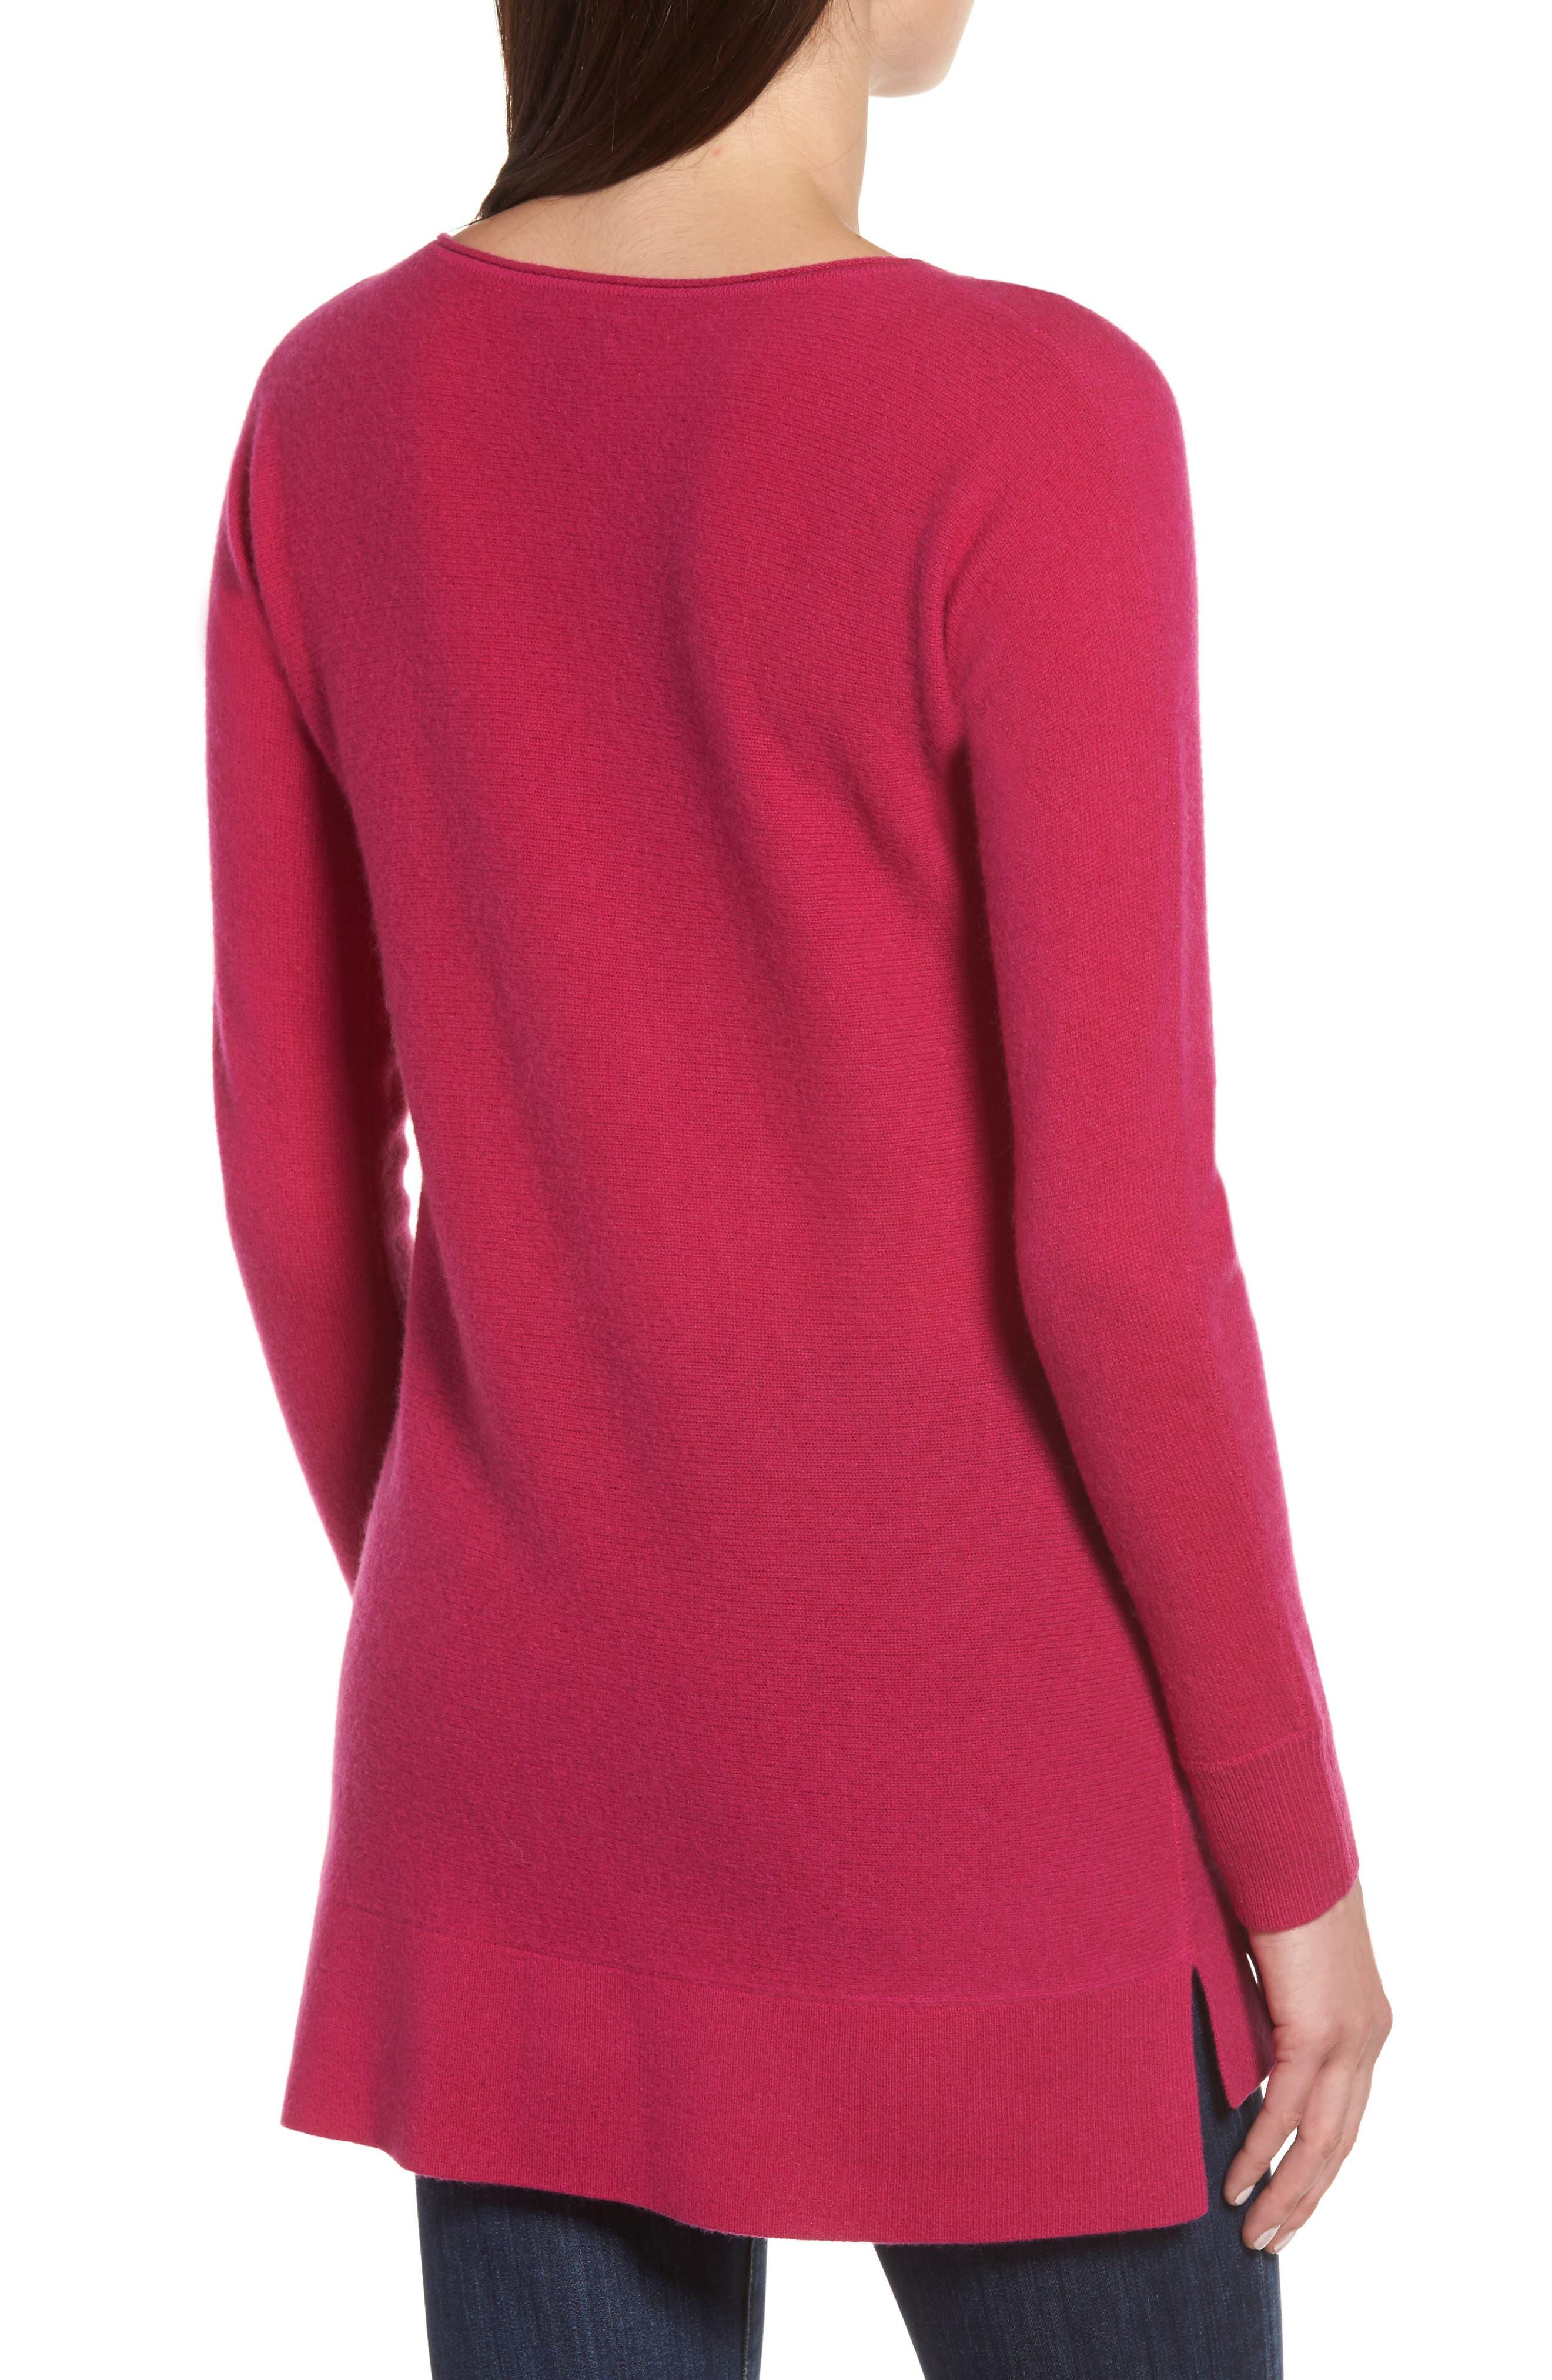 Alternate Image 2  - Halogen® High/Low Wool & Cashmere Tunic Sweater (Regular & Petite)